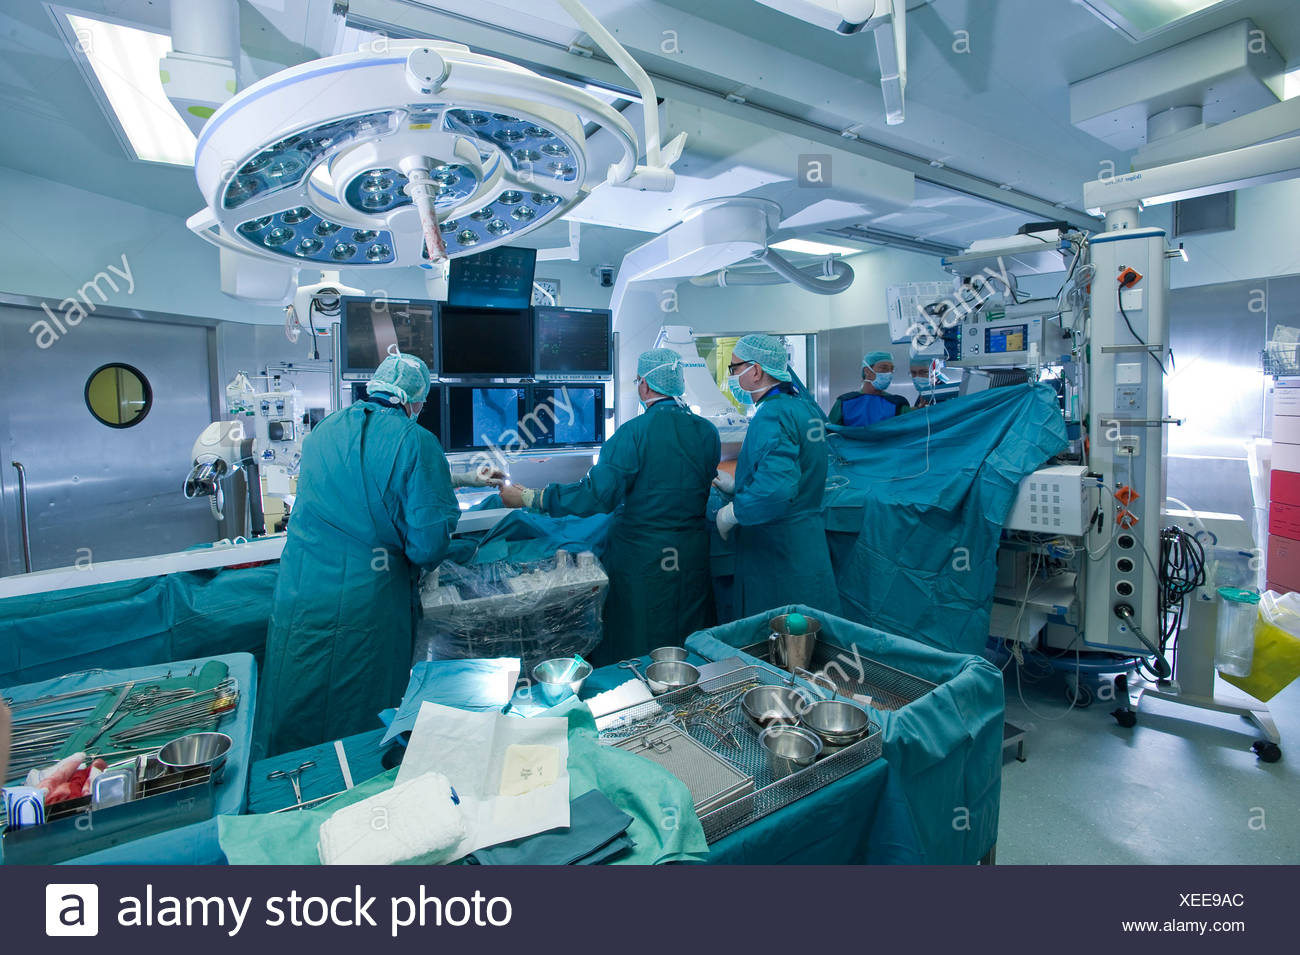 Chirurgie cardiaque dans une salle d'opération hybride, Deutsches Herzzentrum Berlin ou centre cardiaque Allemand, Berlin, Germany, Europe Photo Stock